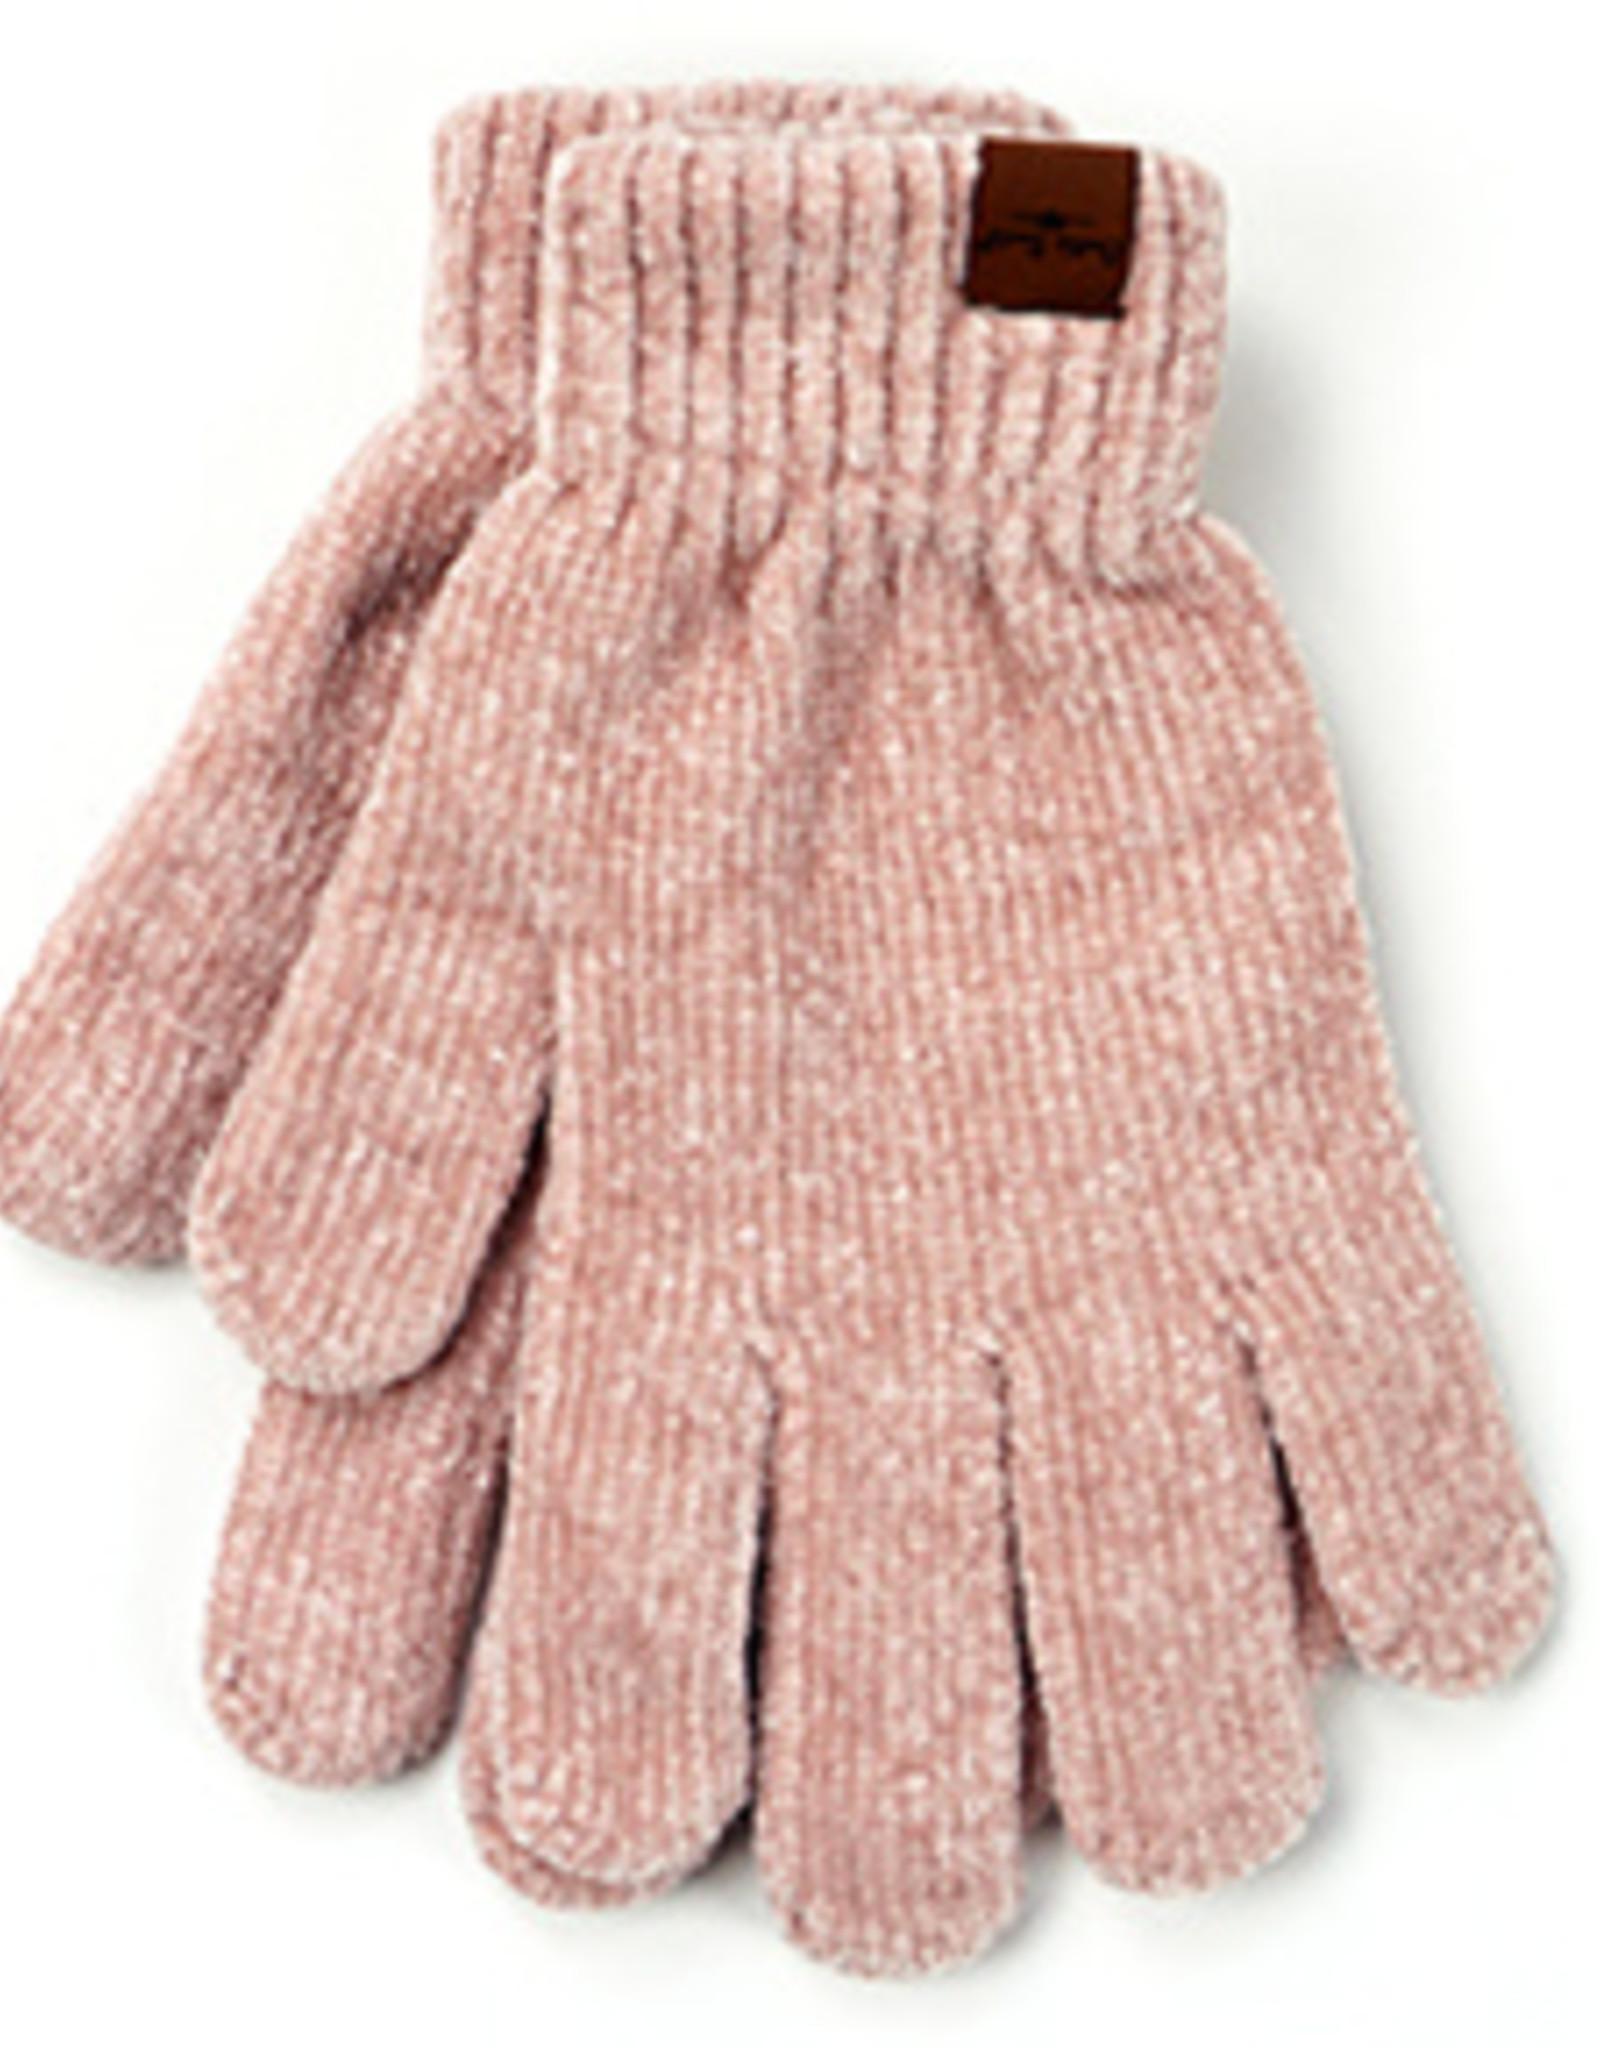 Jack & Missy - Beyond Soft Chenille Gloves